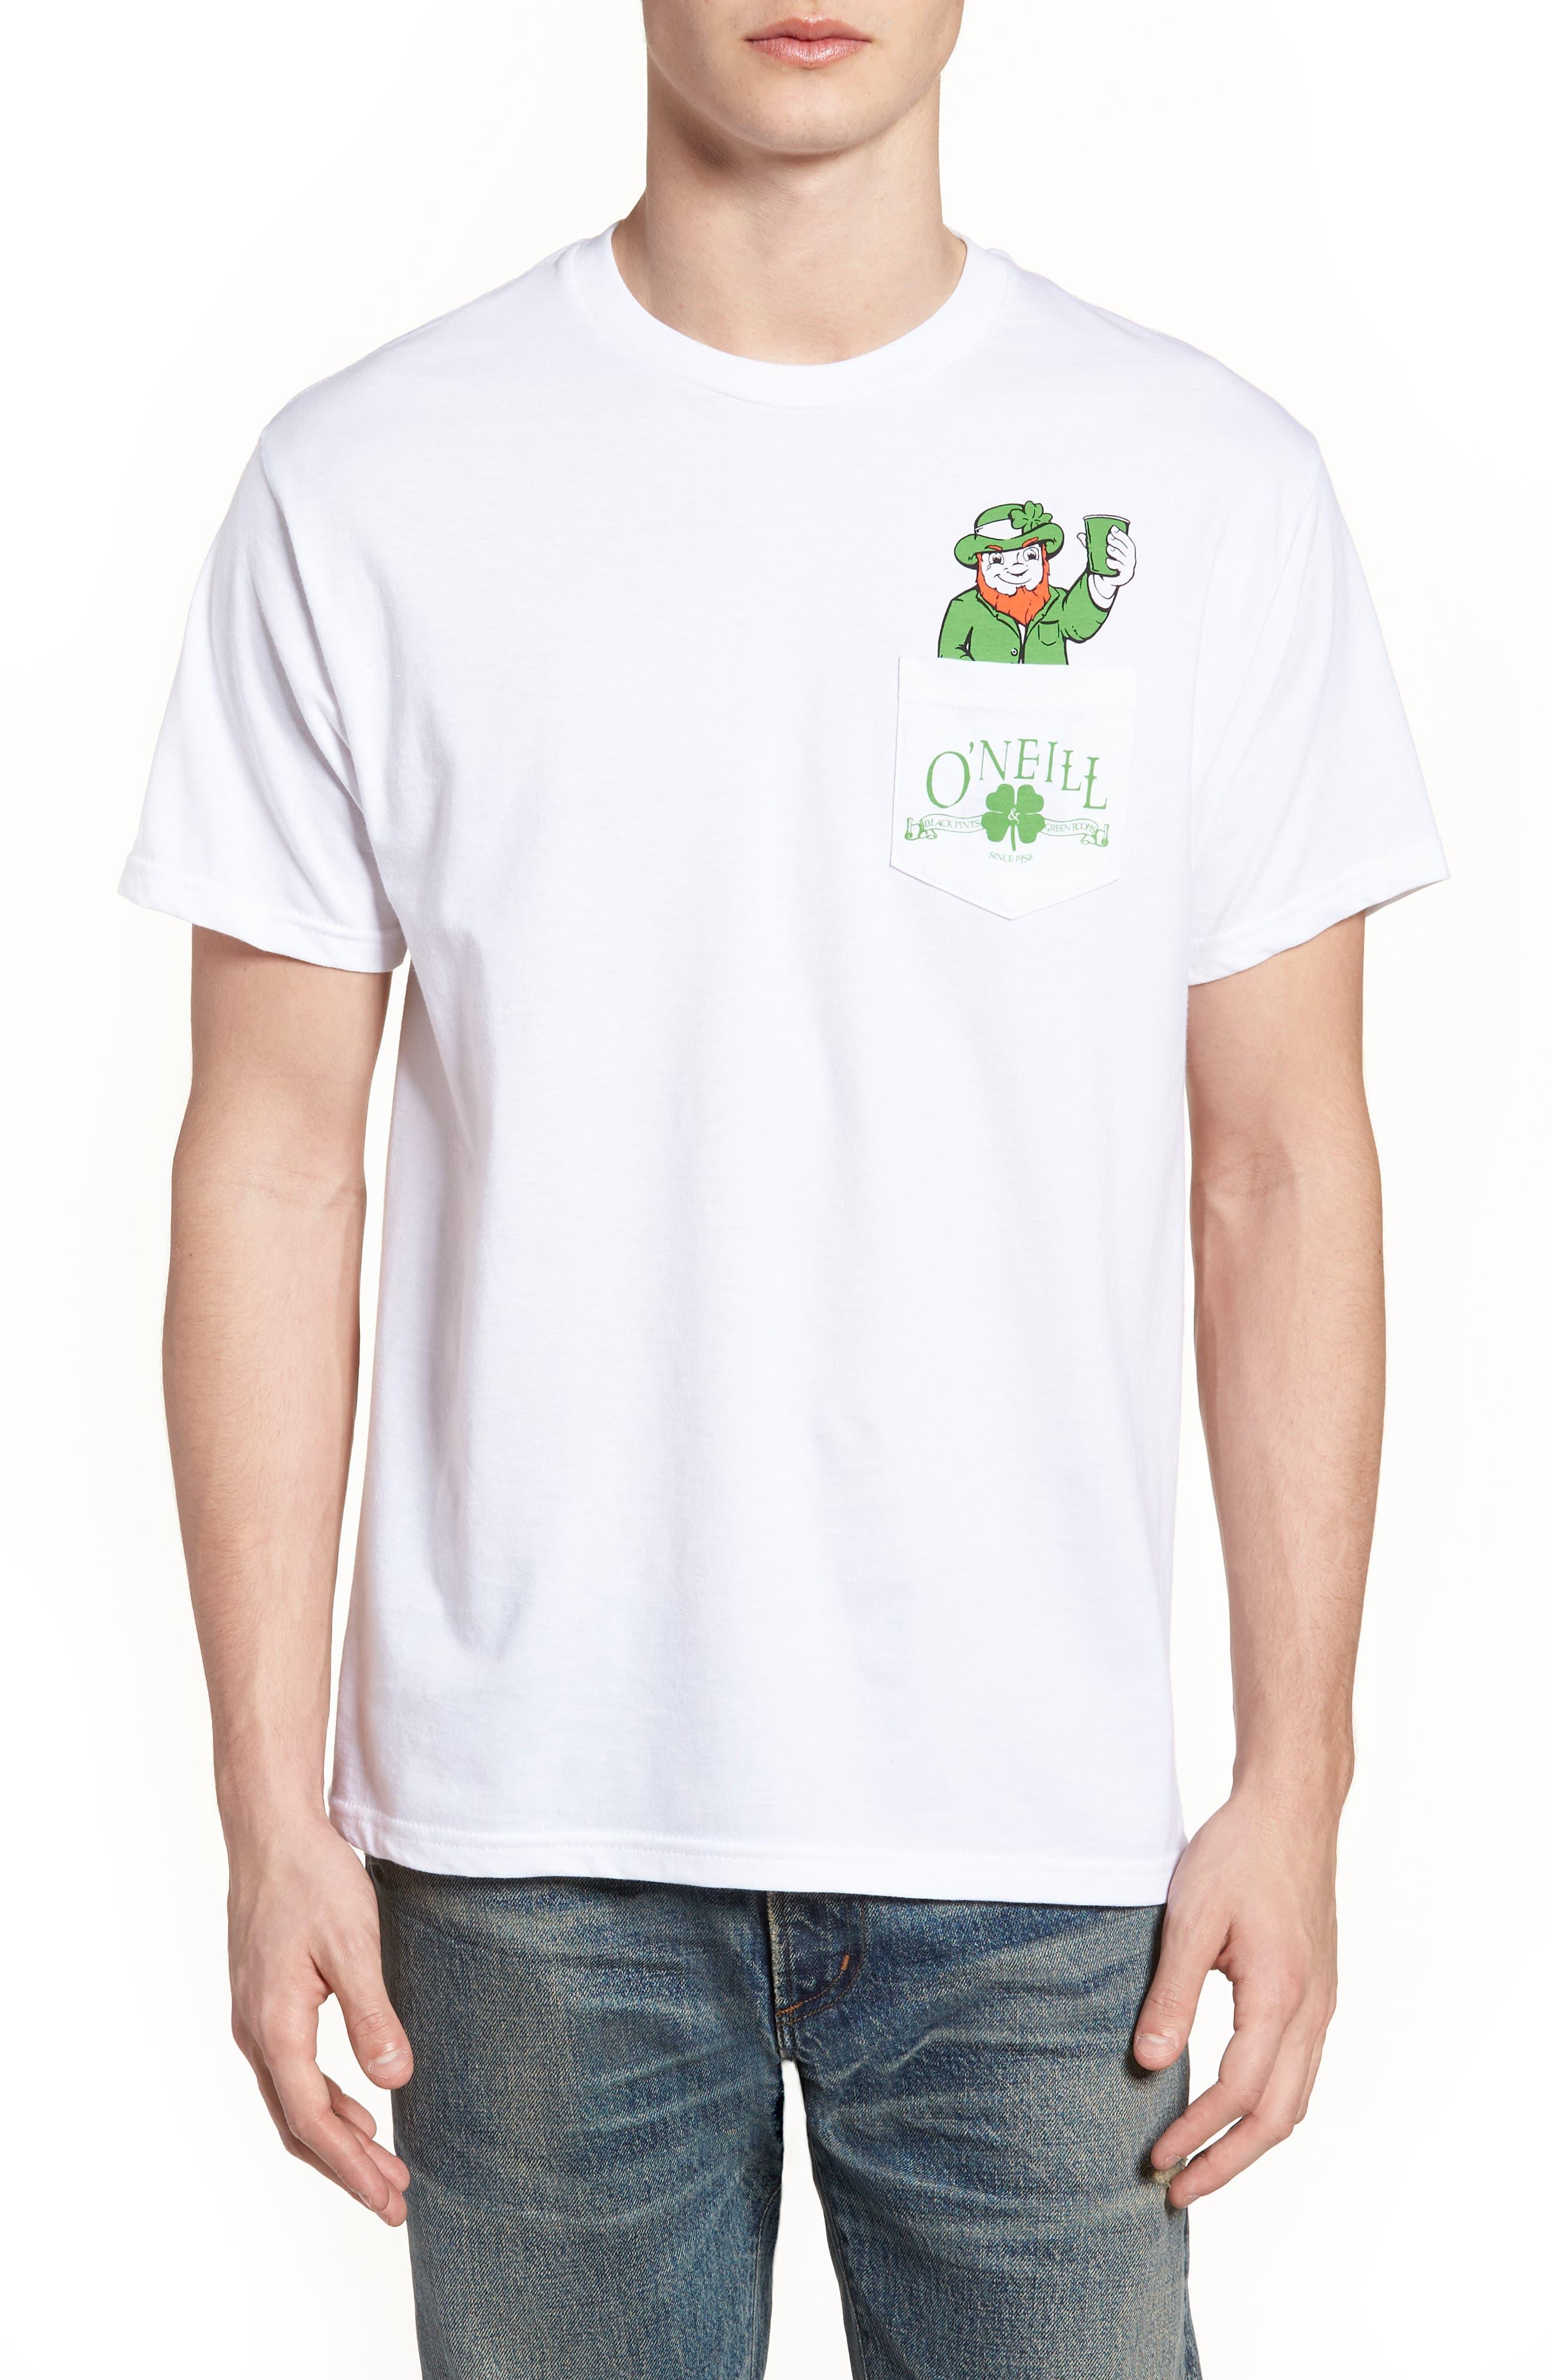 Shinanigans Graphic T-Shirt,                             Main thumbnail 1, color,                             White